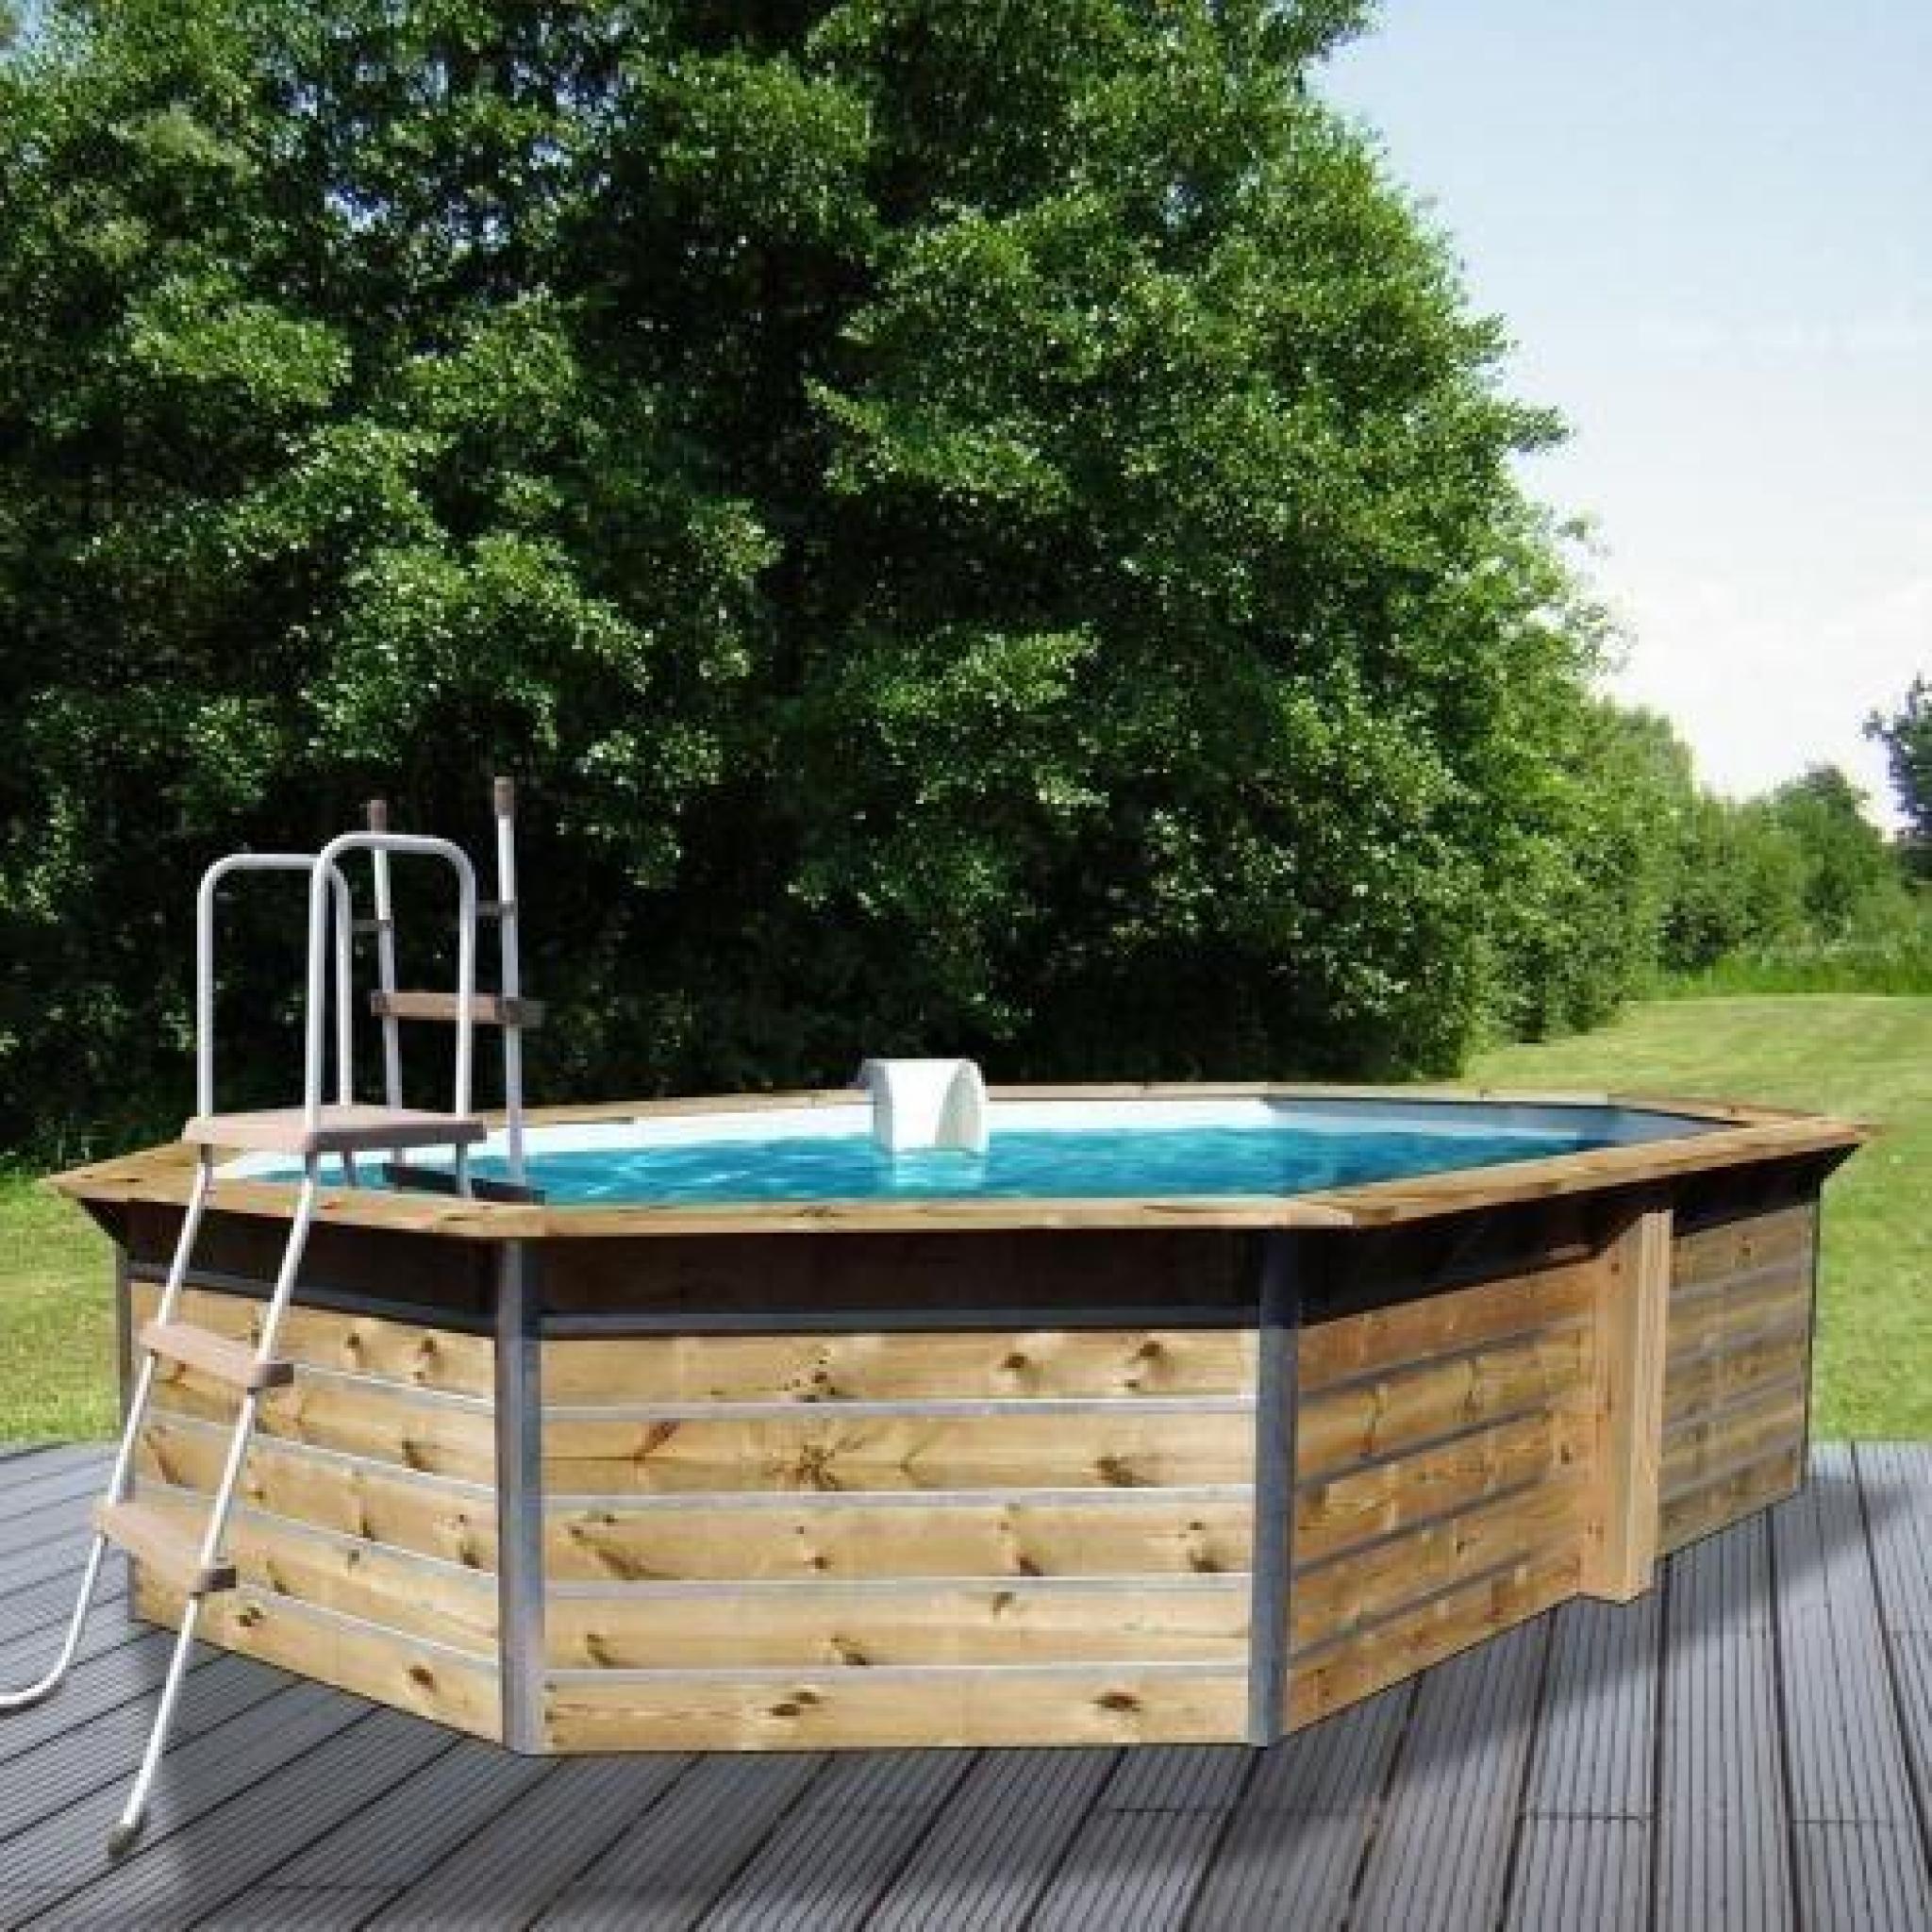 piscine bois hexagonale waterclip 530 x 370 x 1 achat. Black Bedroom Furniture Sets. Home Design Ideas